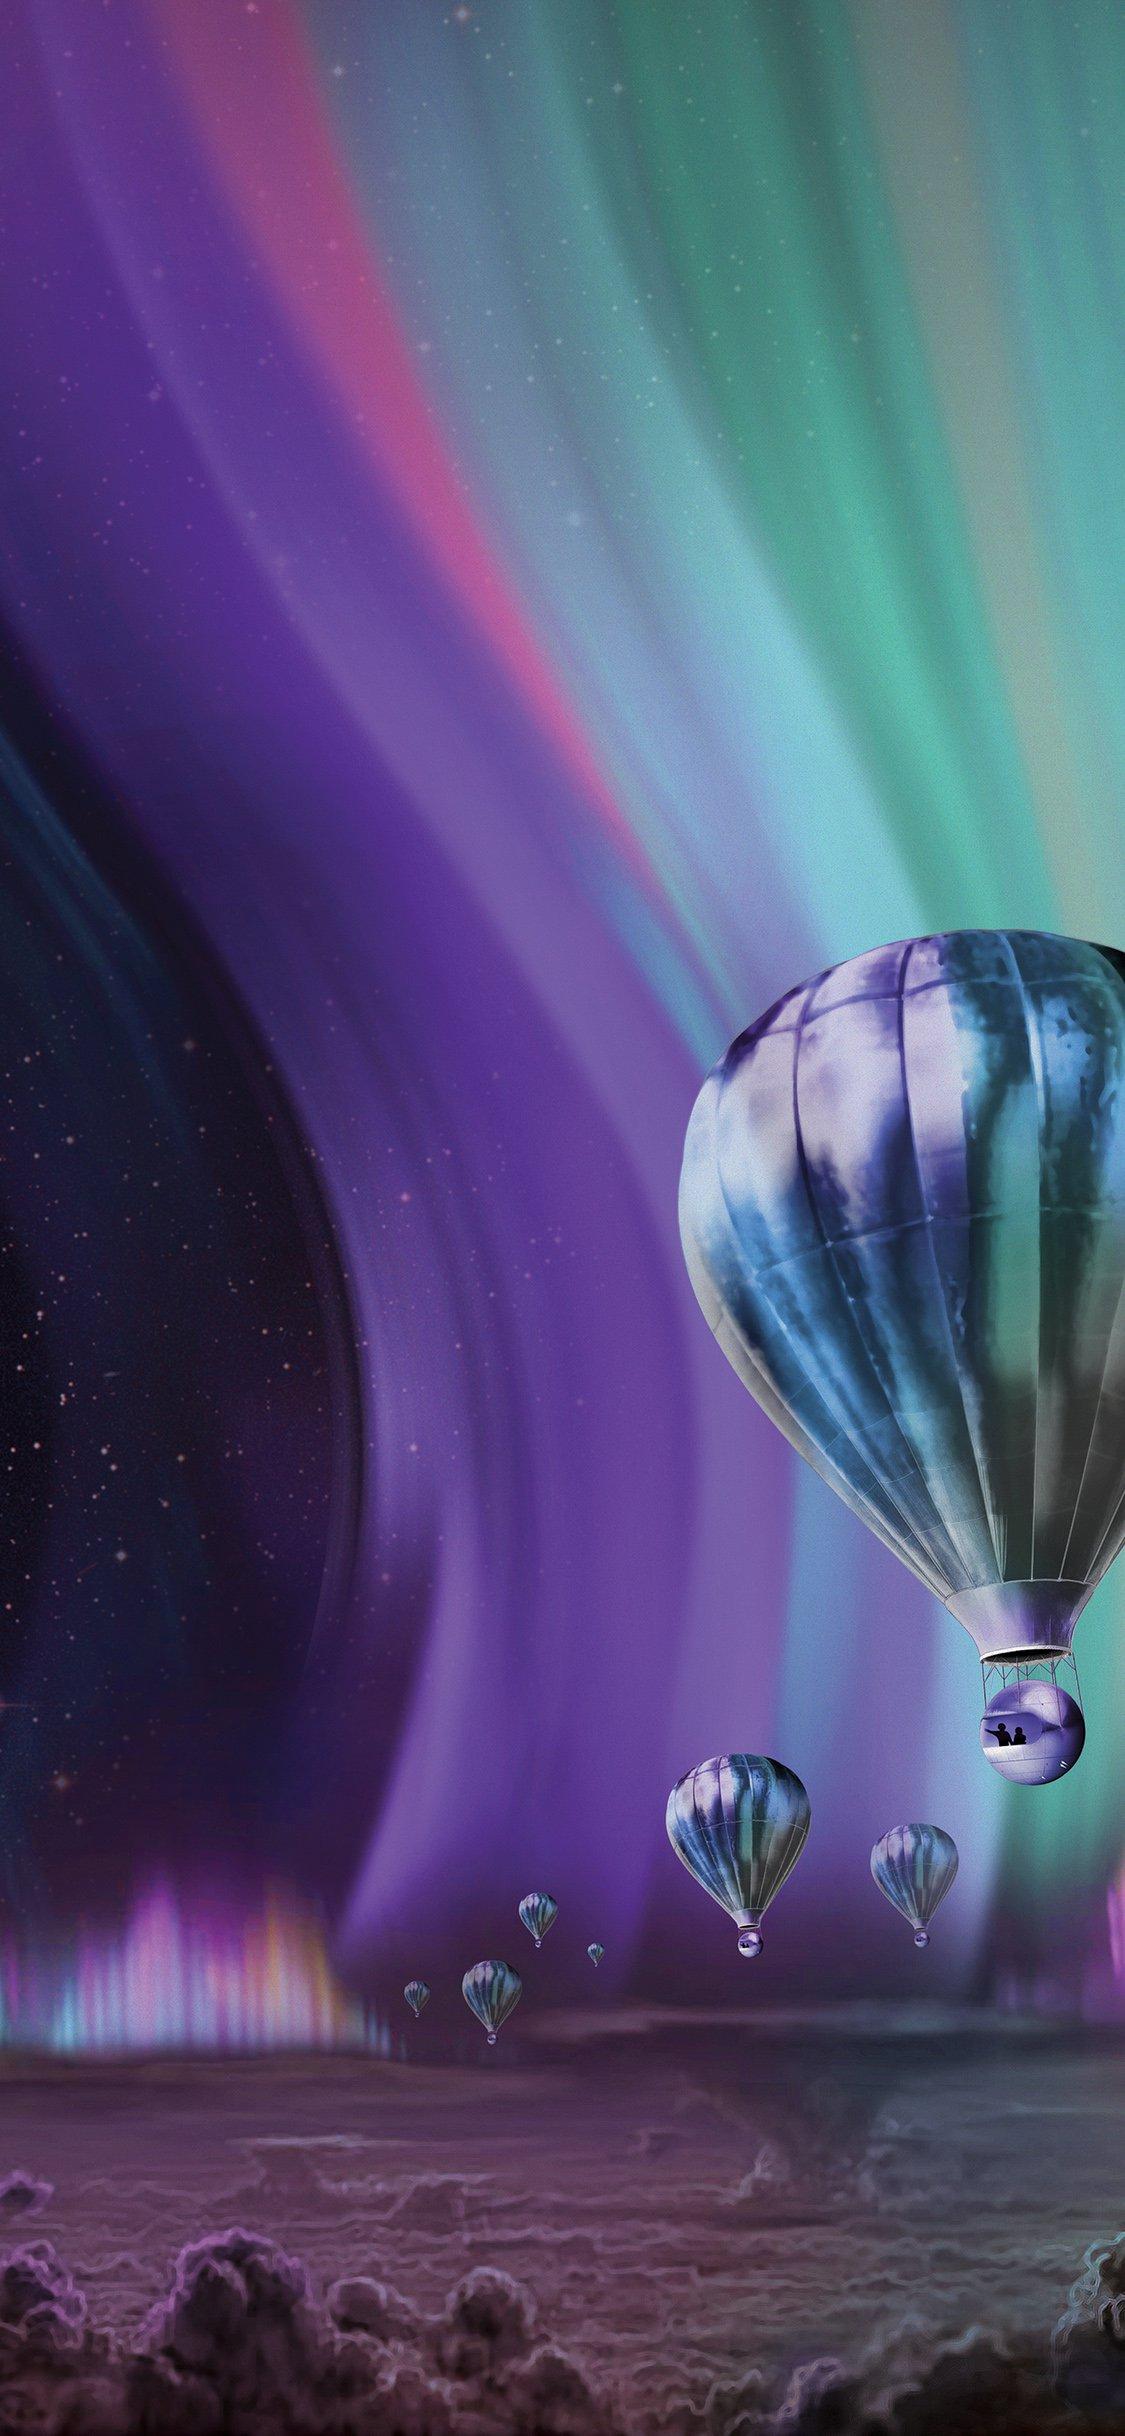 Jupiter Aurora Space Sky Art Iphone X Wallpapers Free Download